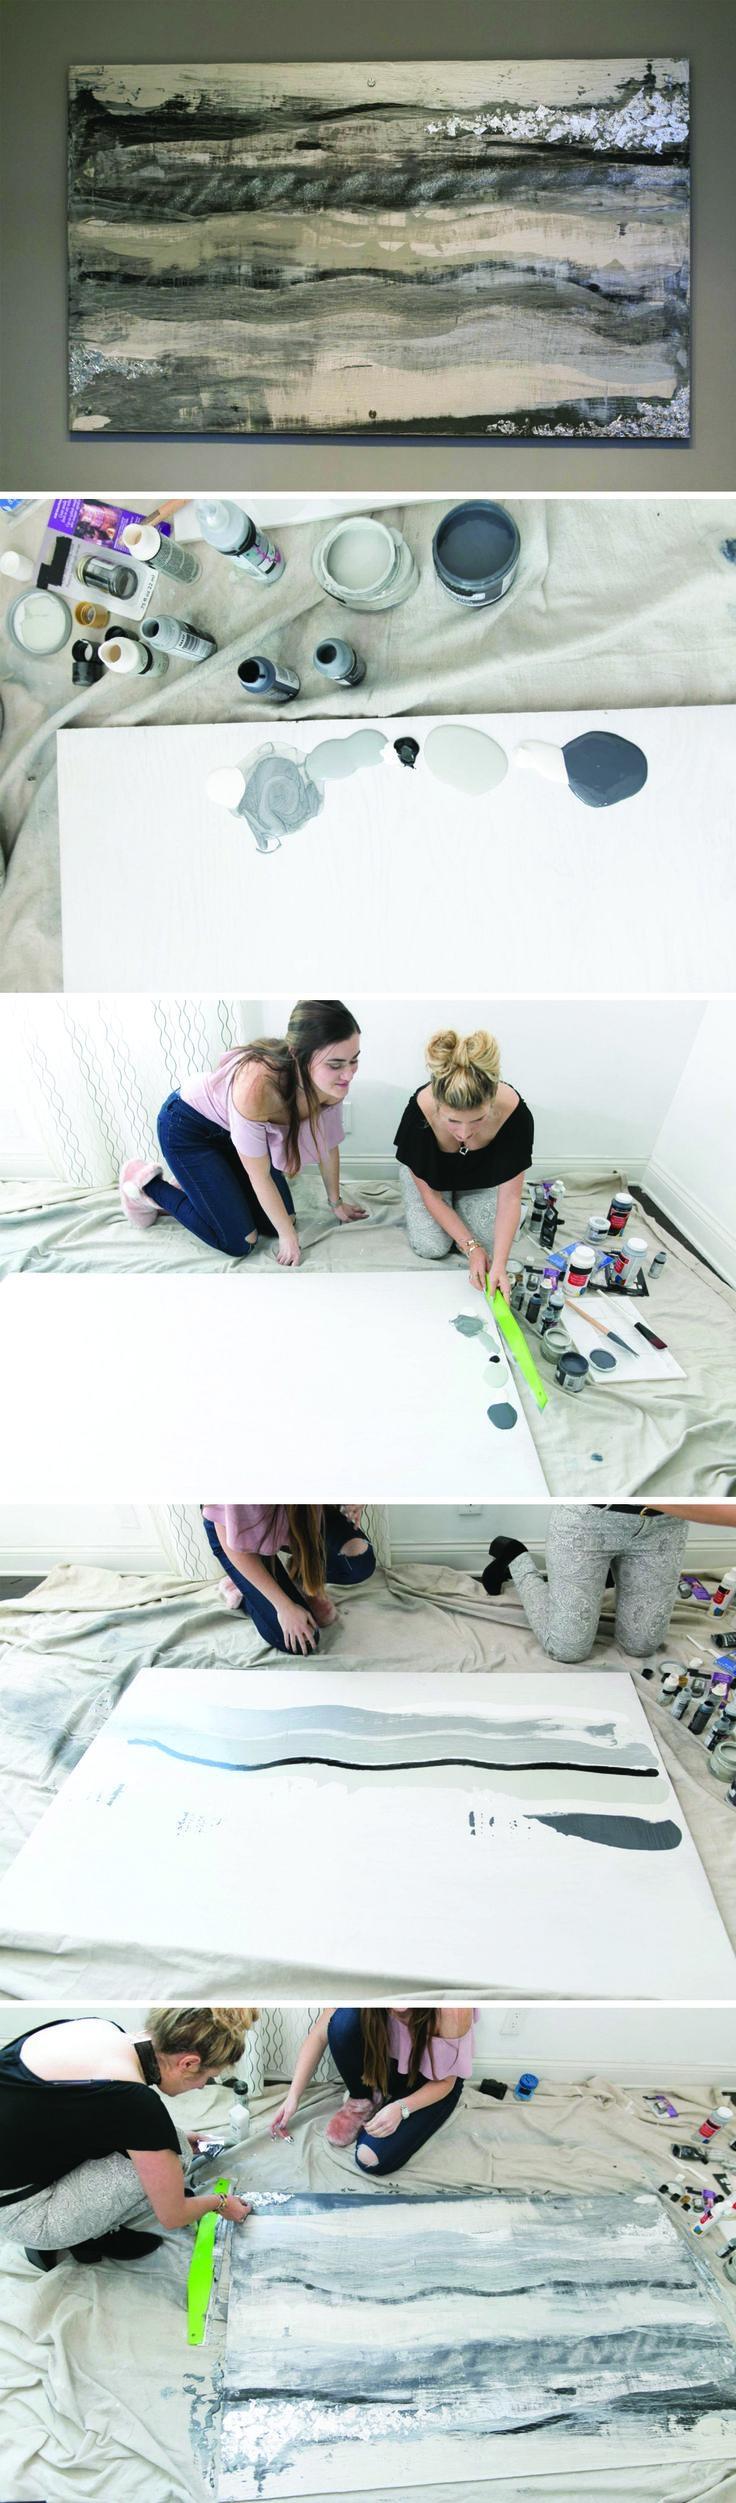 Best 25+ Bathroom Wall Art Ideas On Pinterest | Wall Decor For For Glamorous Bathroom Wall Art (View 18 of 20)